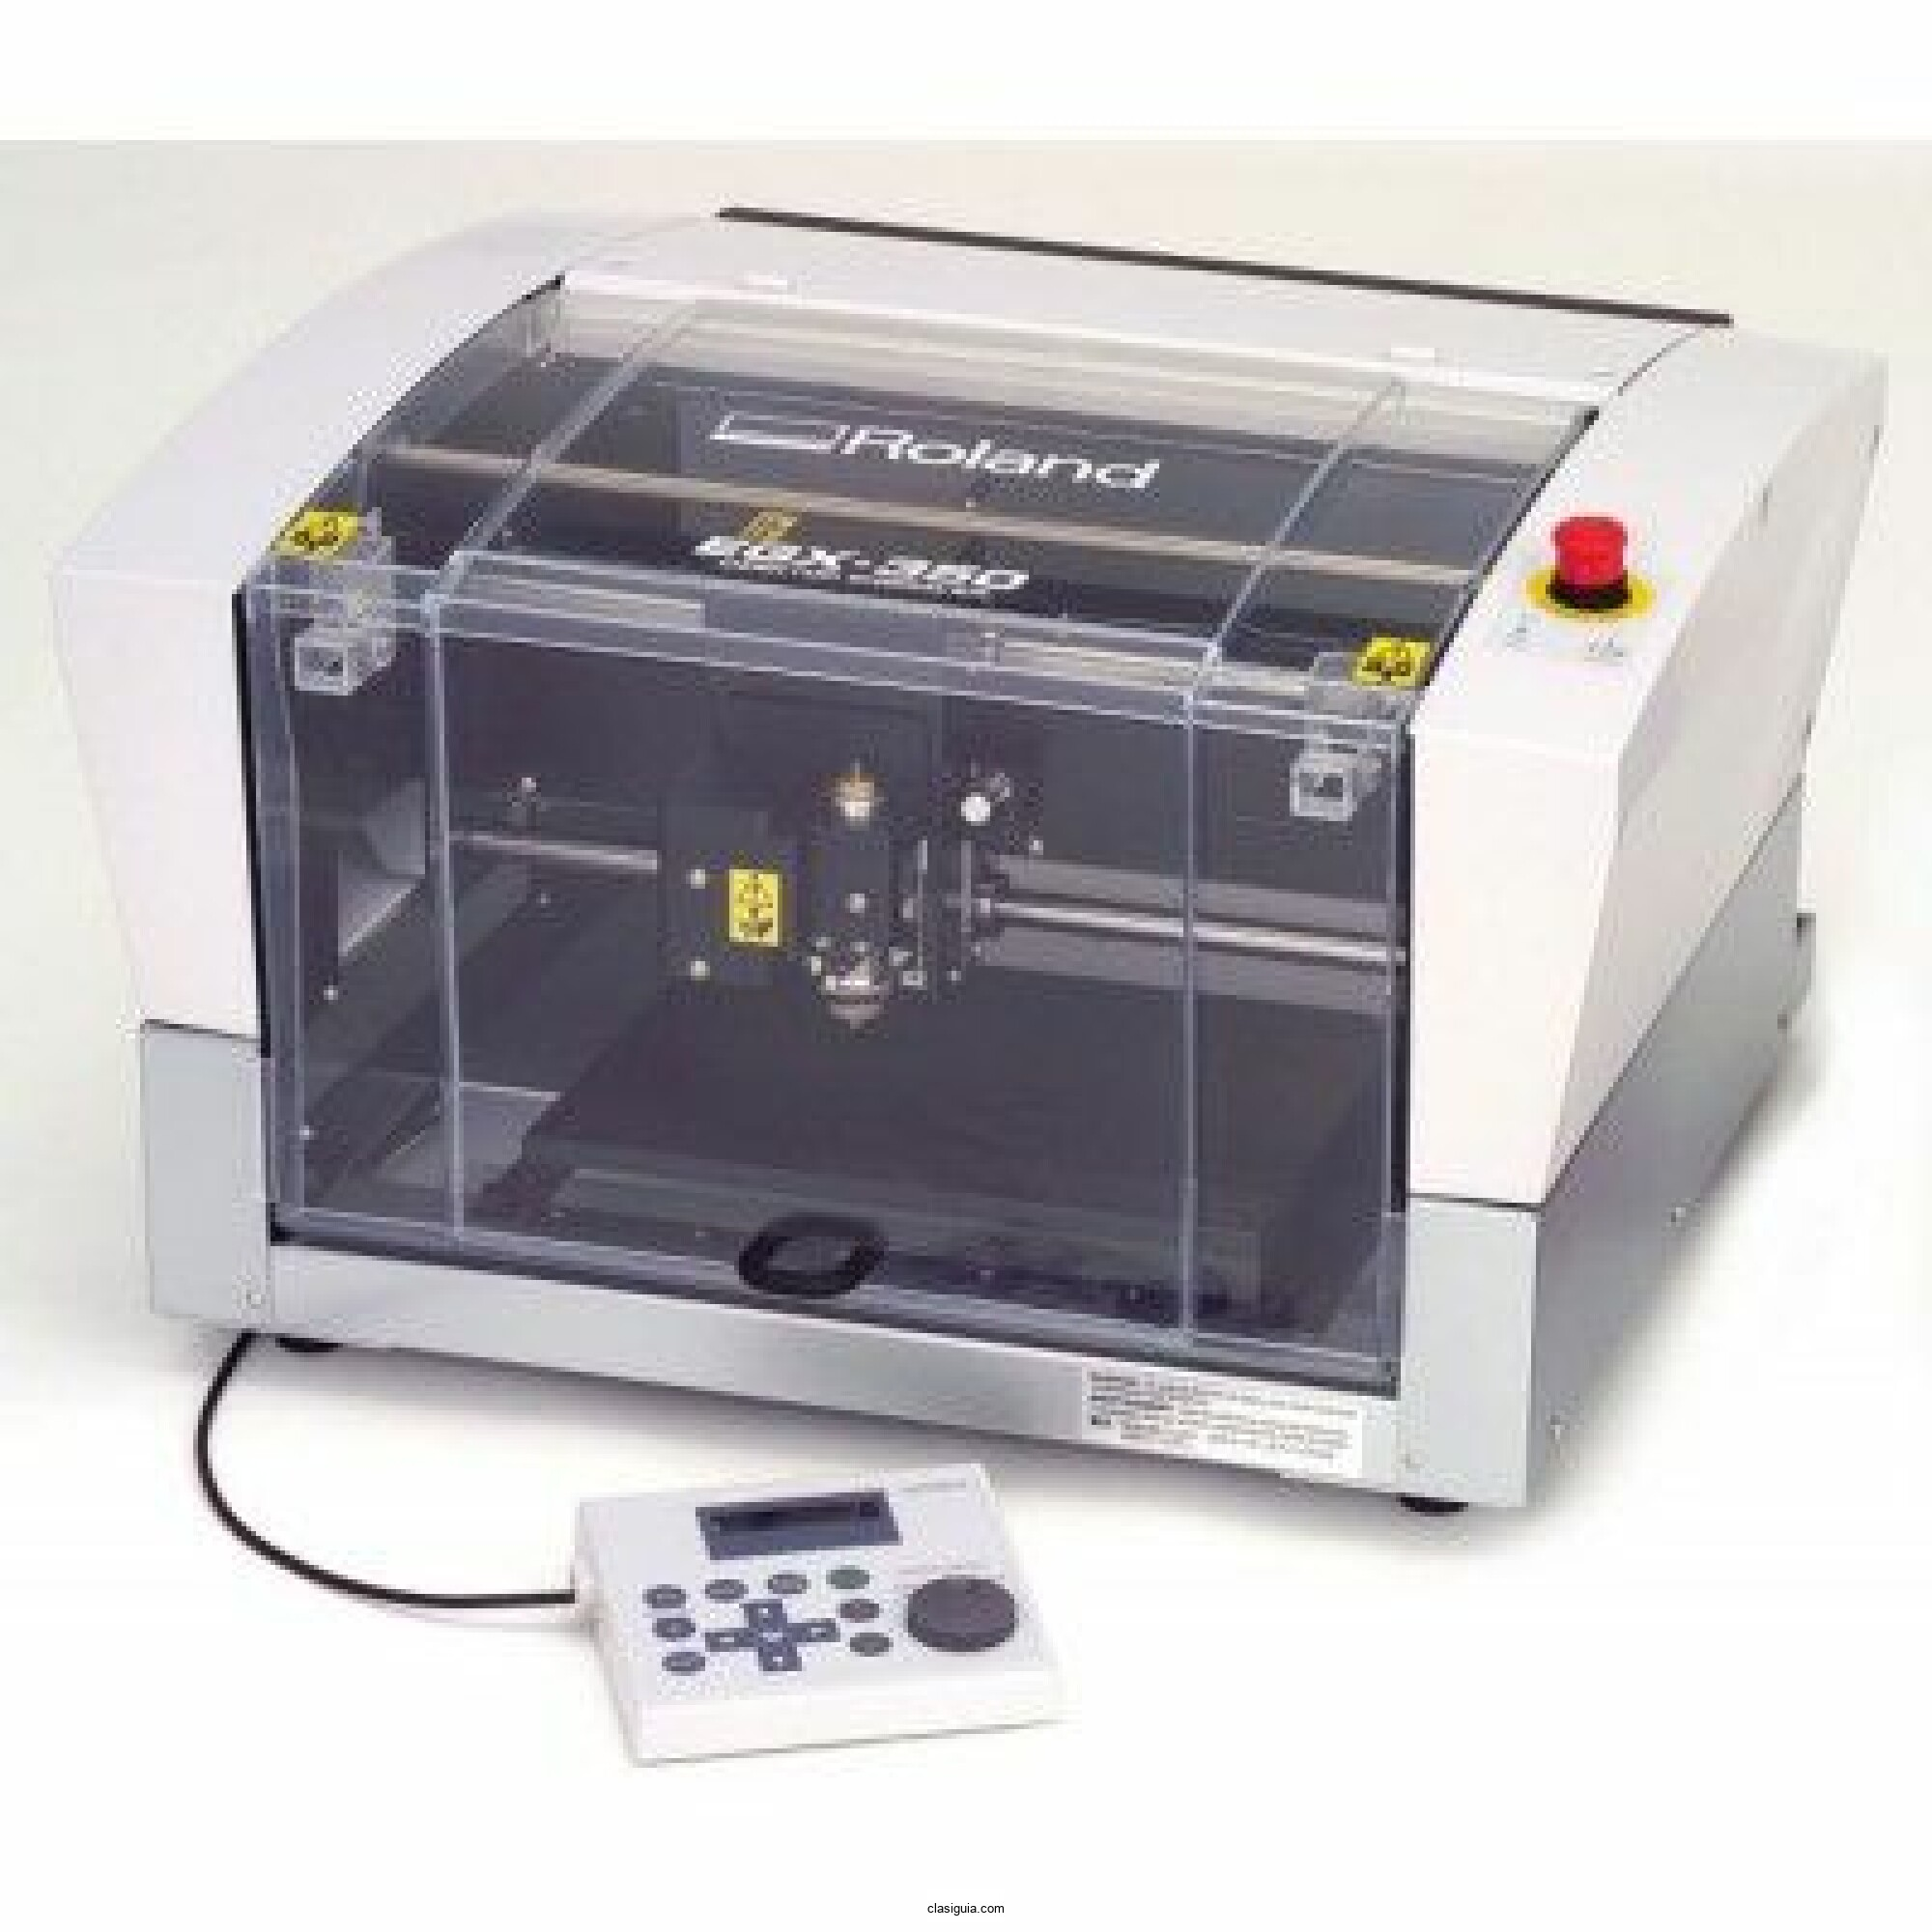 Roland EGX-350 Automatic Engraving Machine (MITRA PRINT)